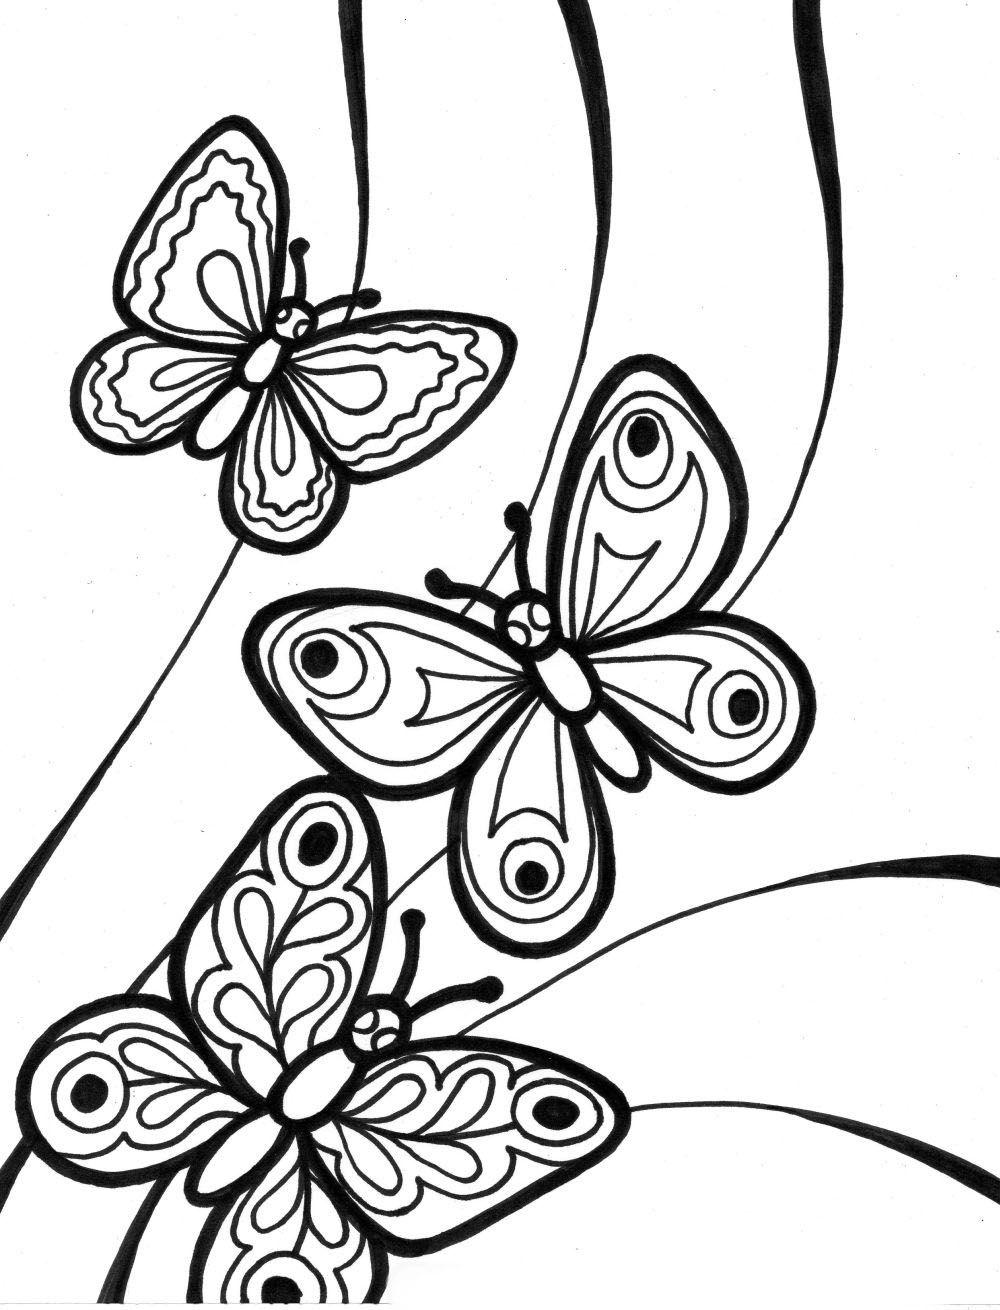 mariposas para colorear faciles dibujos pinterest coloring